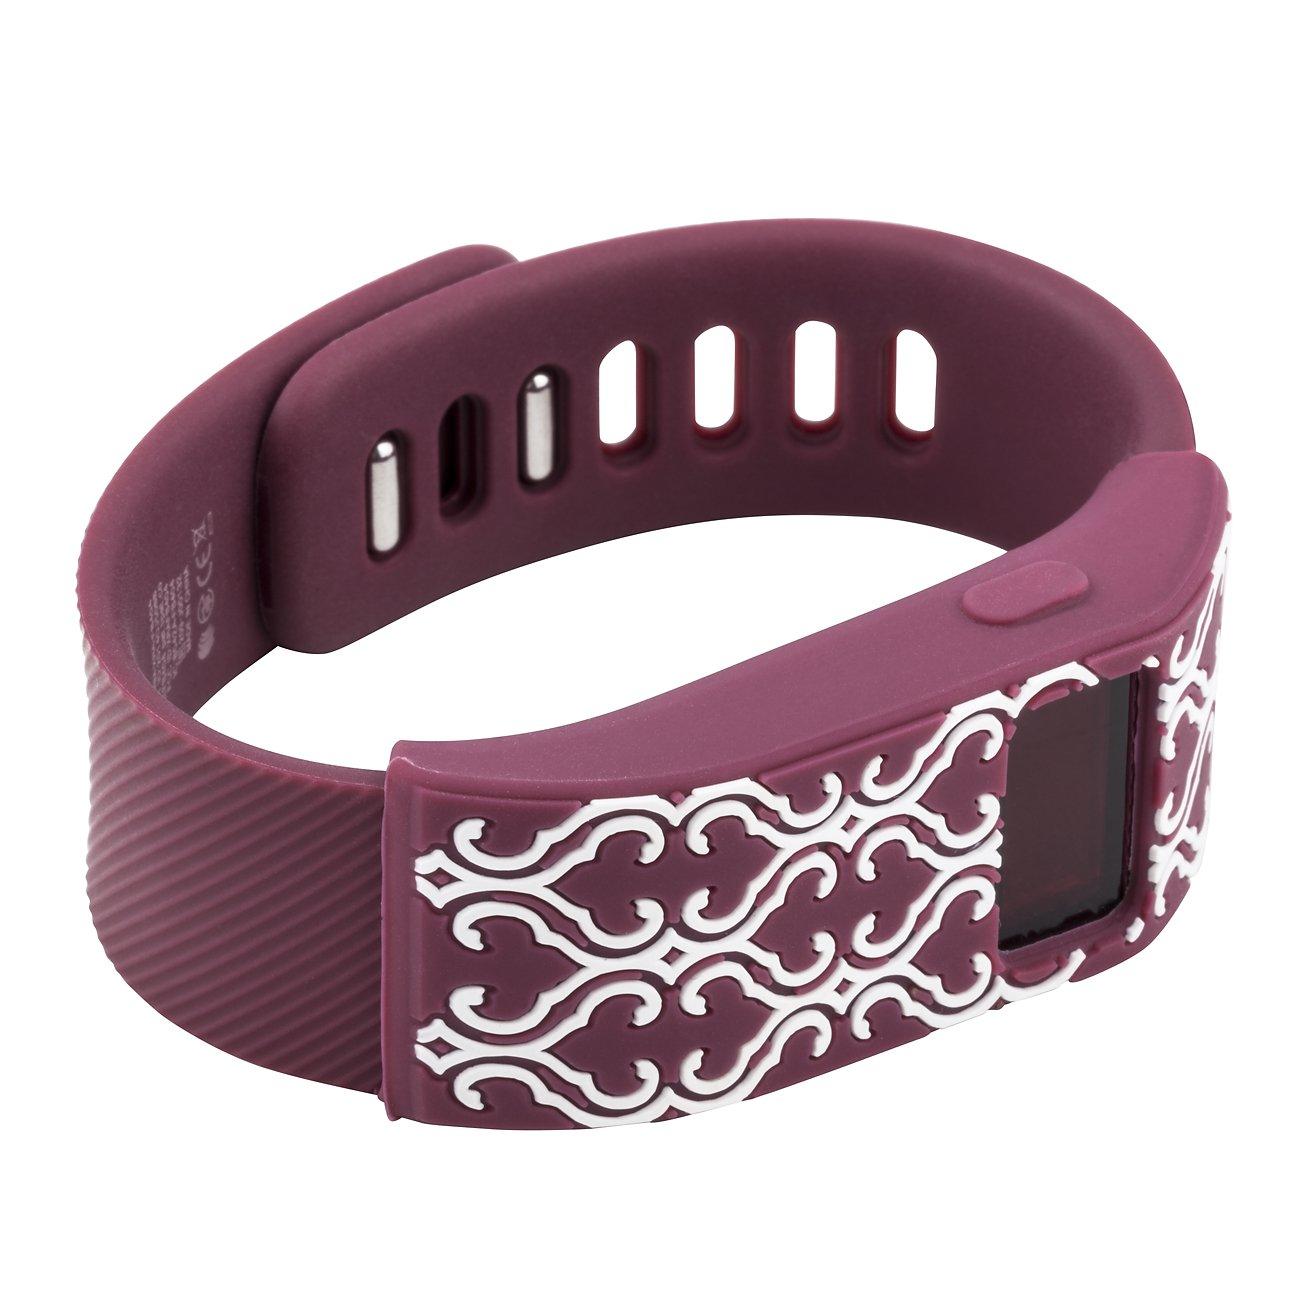 Sister Fitbit Charge Designer Sleeve Image 1